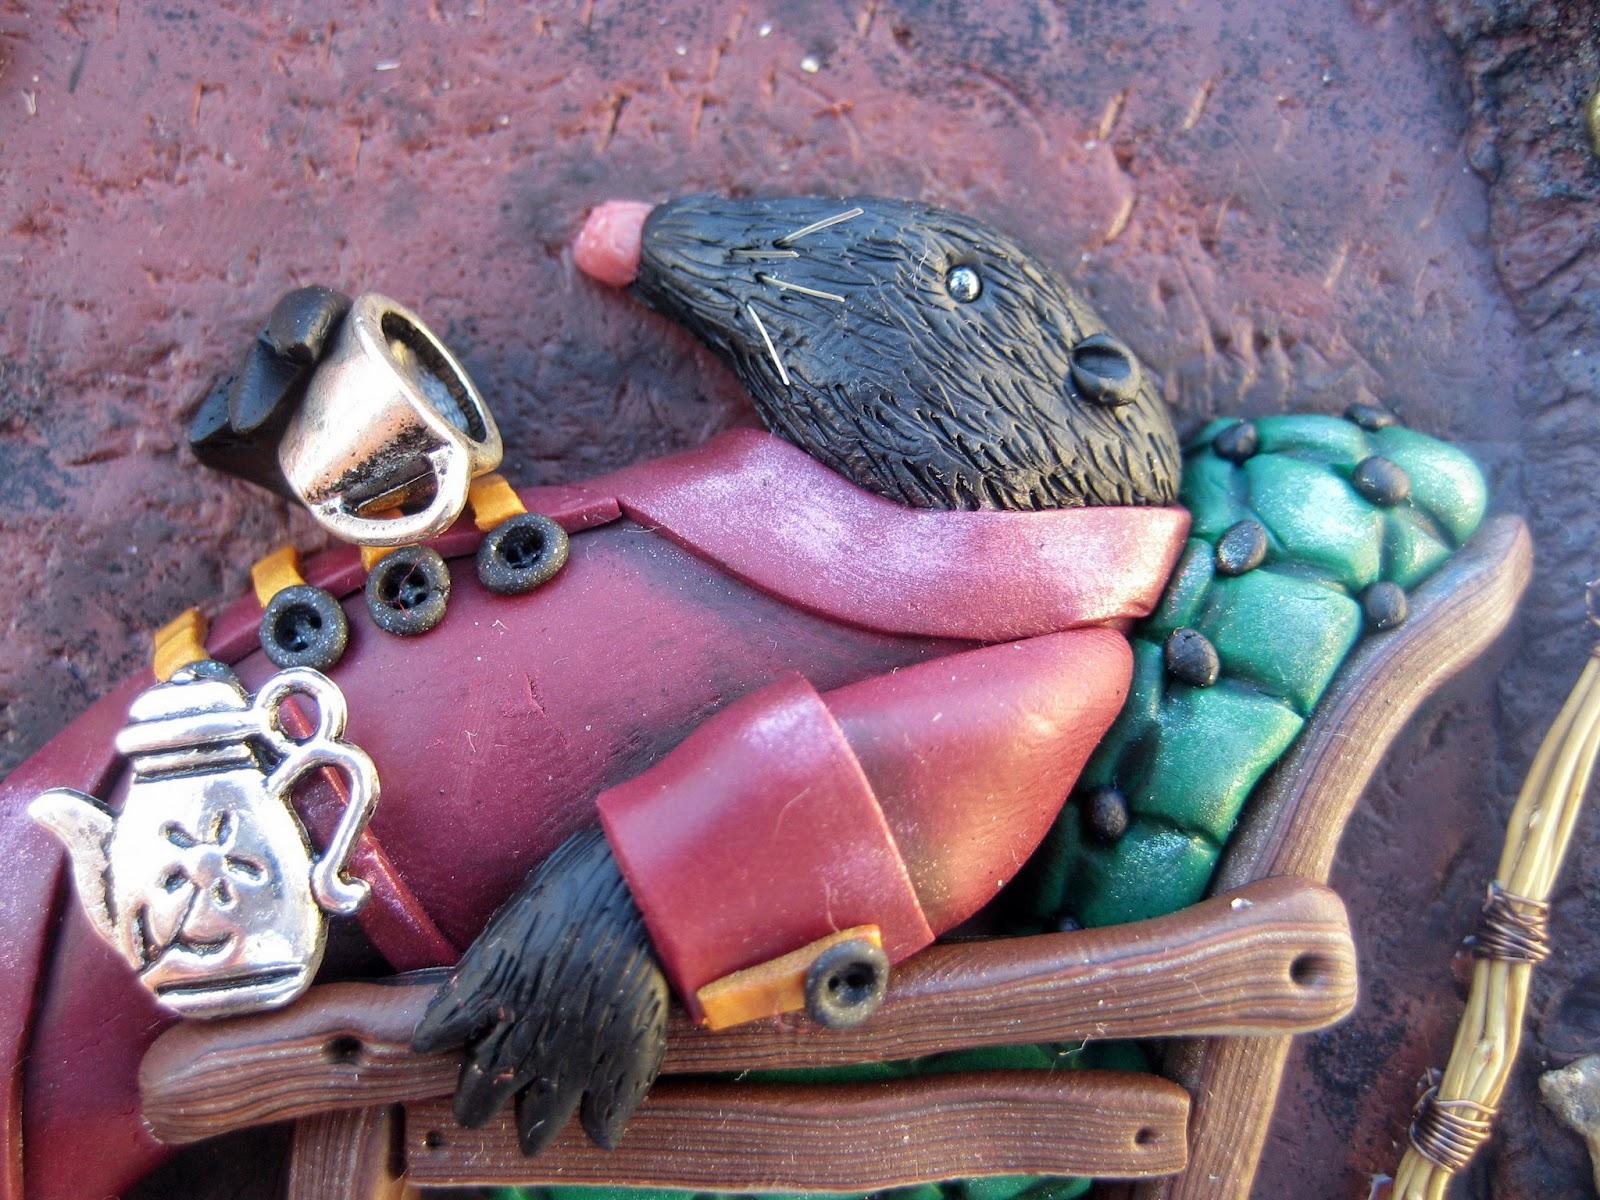 mole, thumbelina, fairytale, baśnie, calineczka, kret